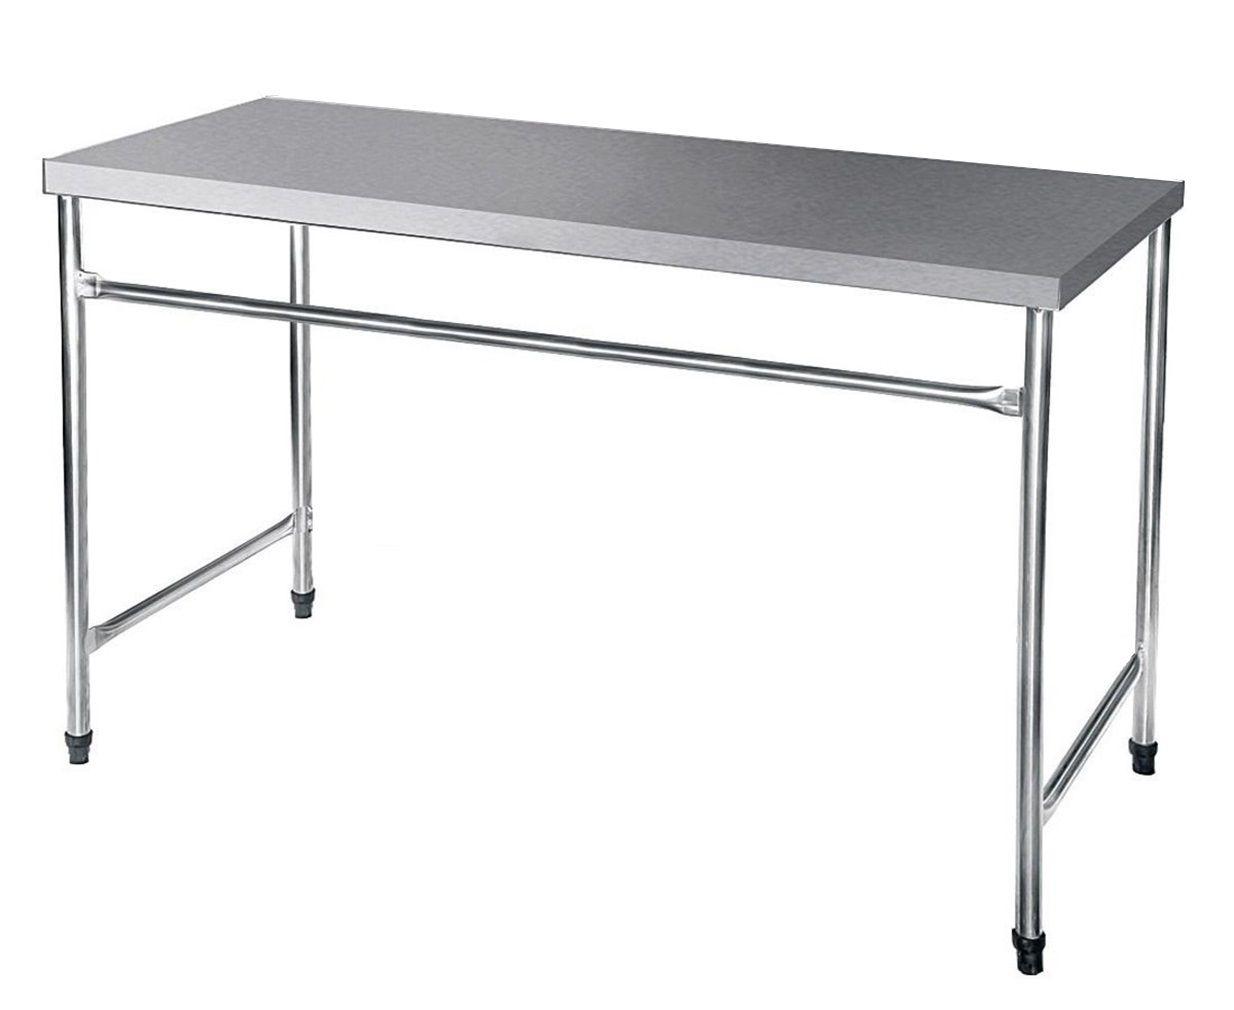 Bancada / Mesa Em Aço Inox (150x60x85)